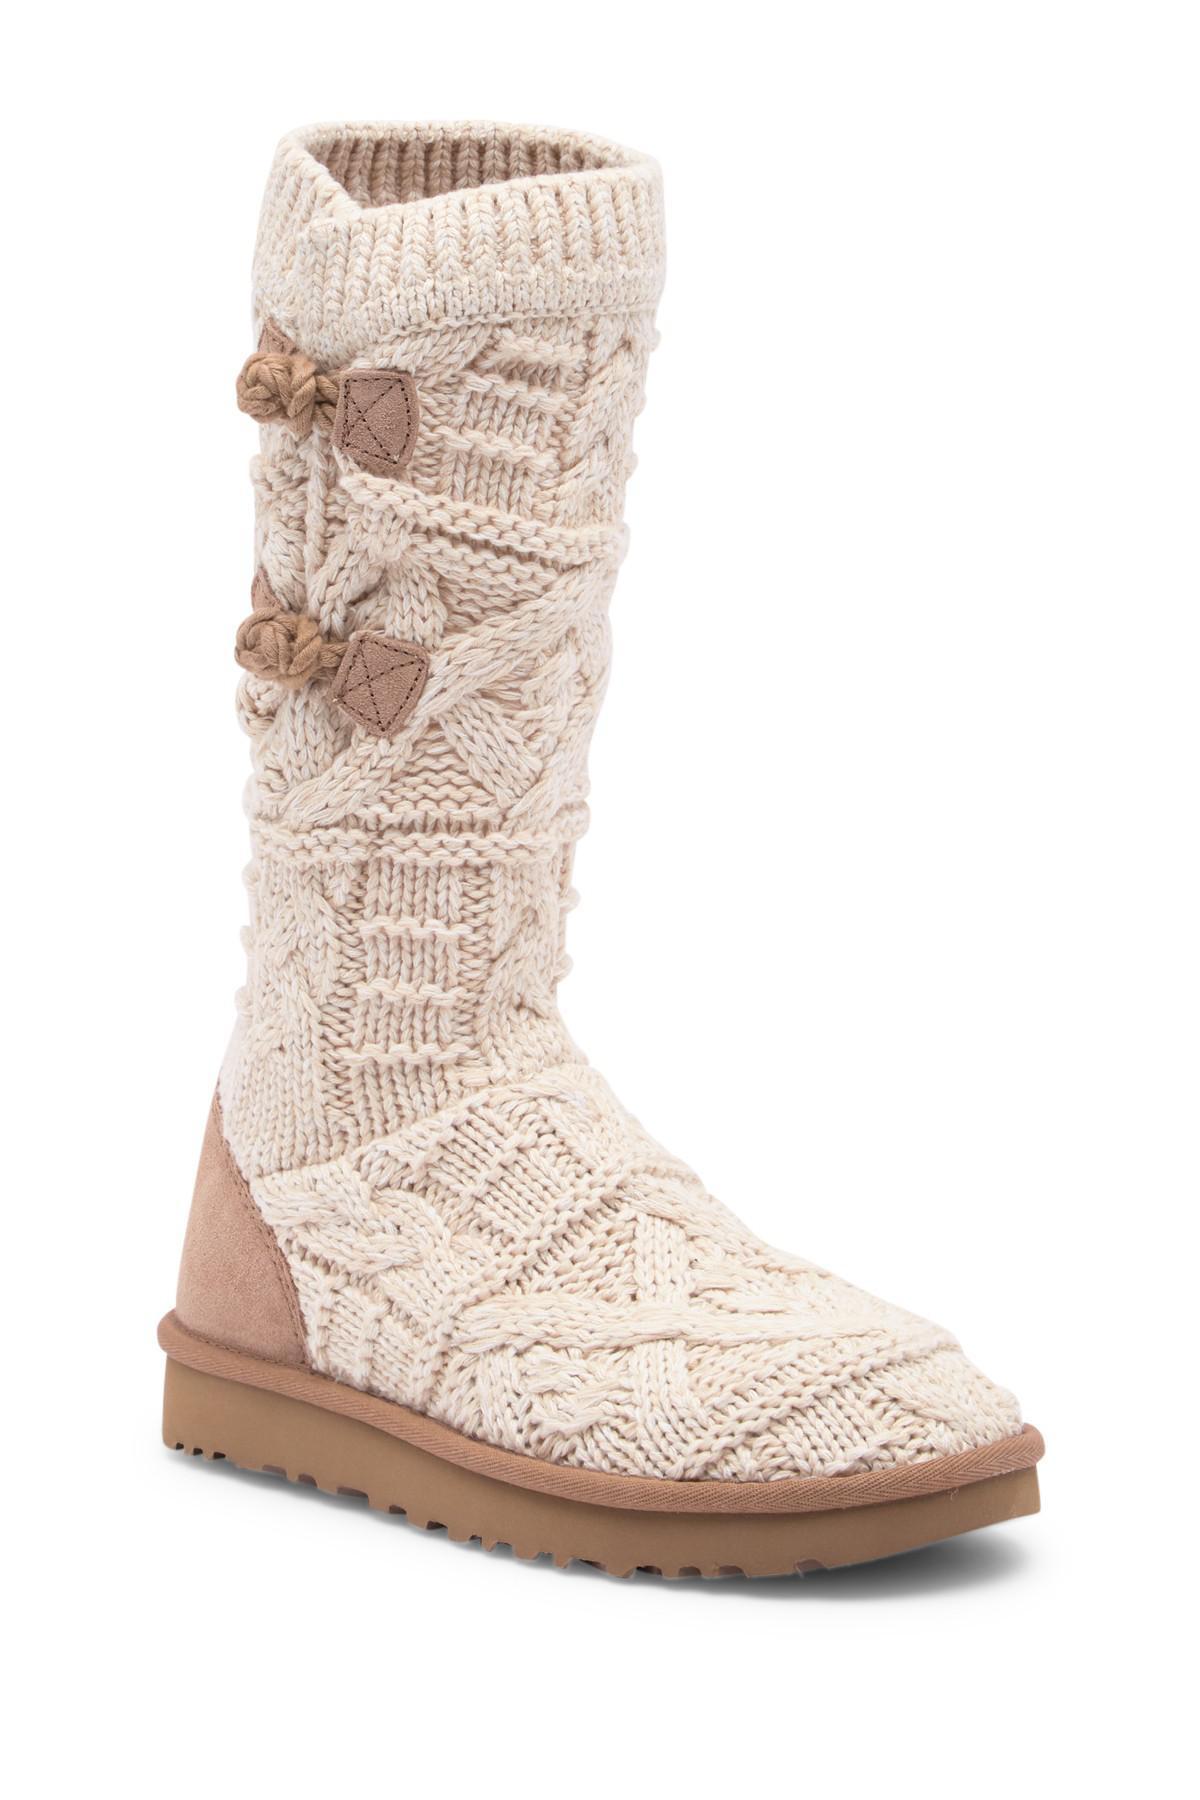 Ugg Crochet Boots